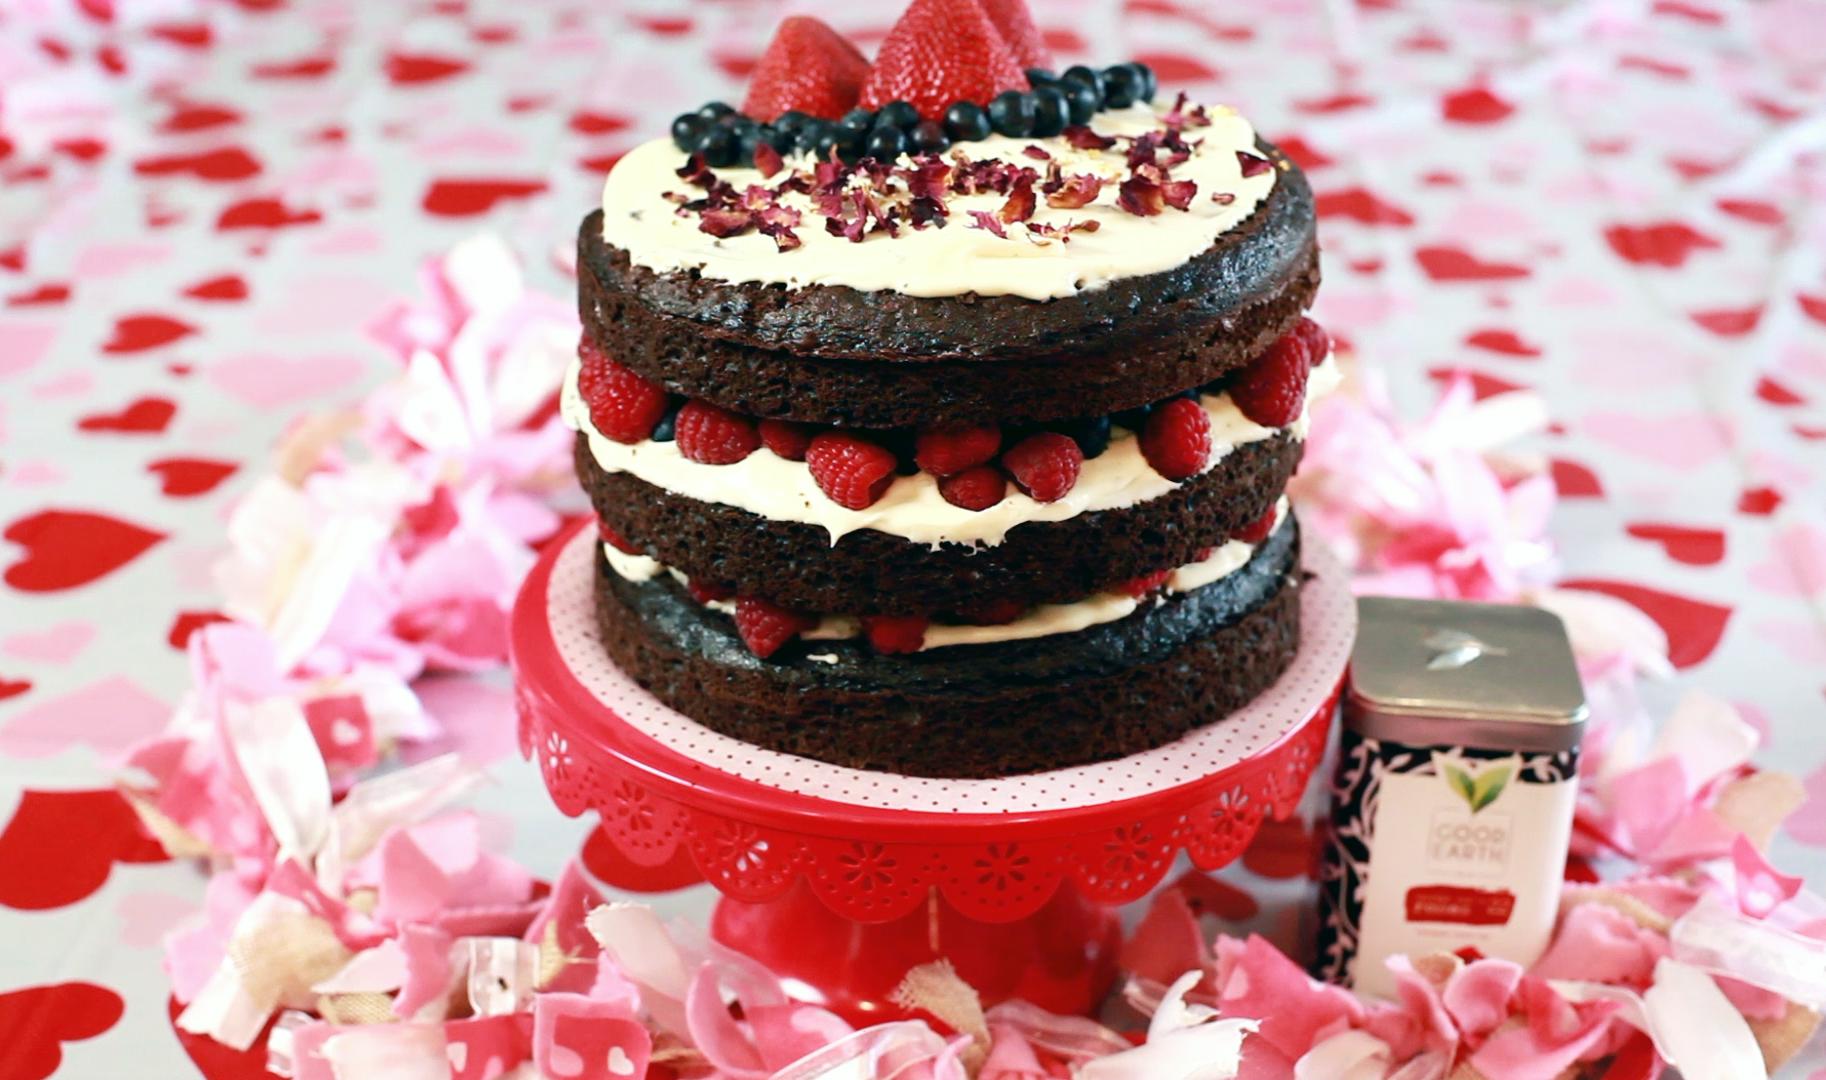 chocolate-cake-with-berries-dina.jpg